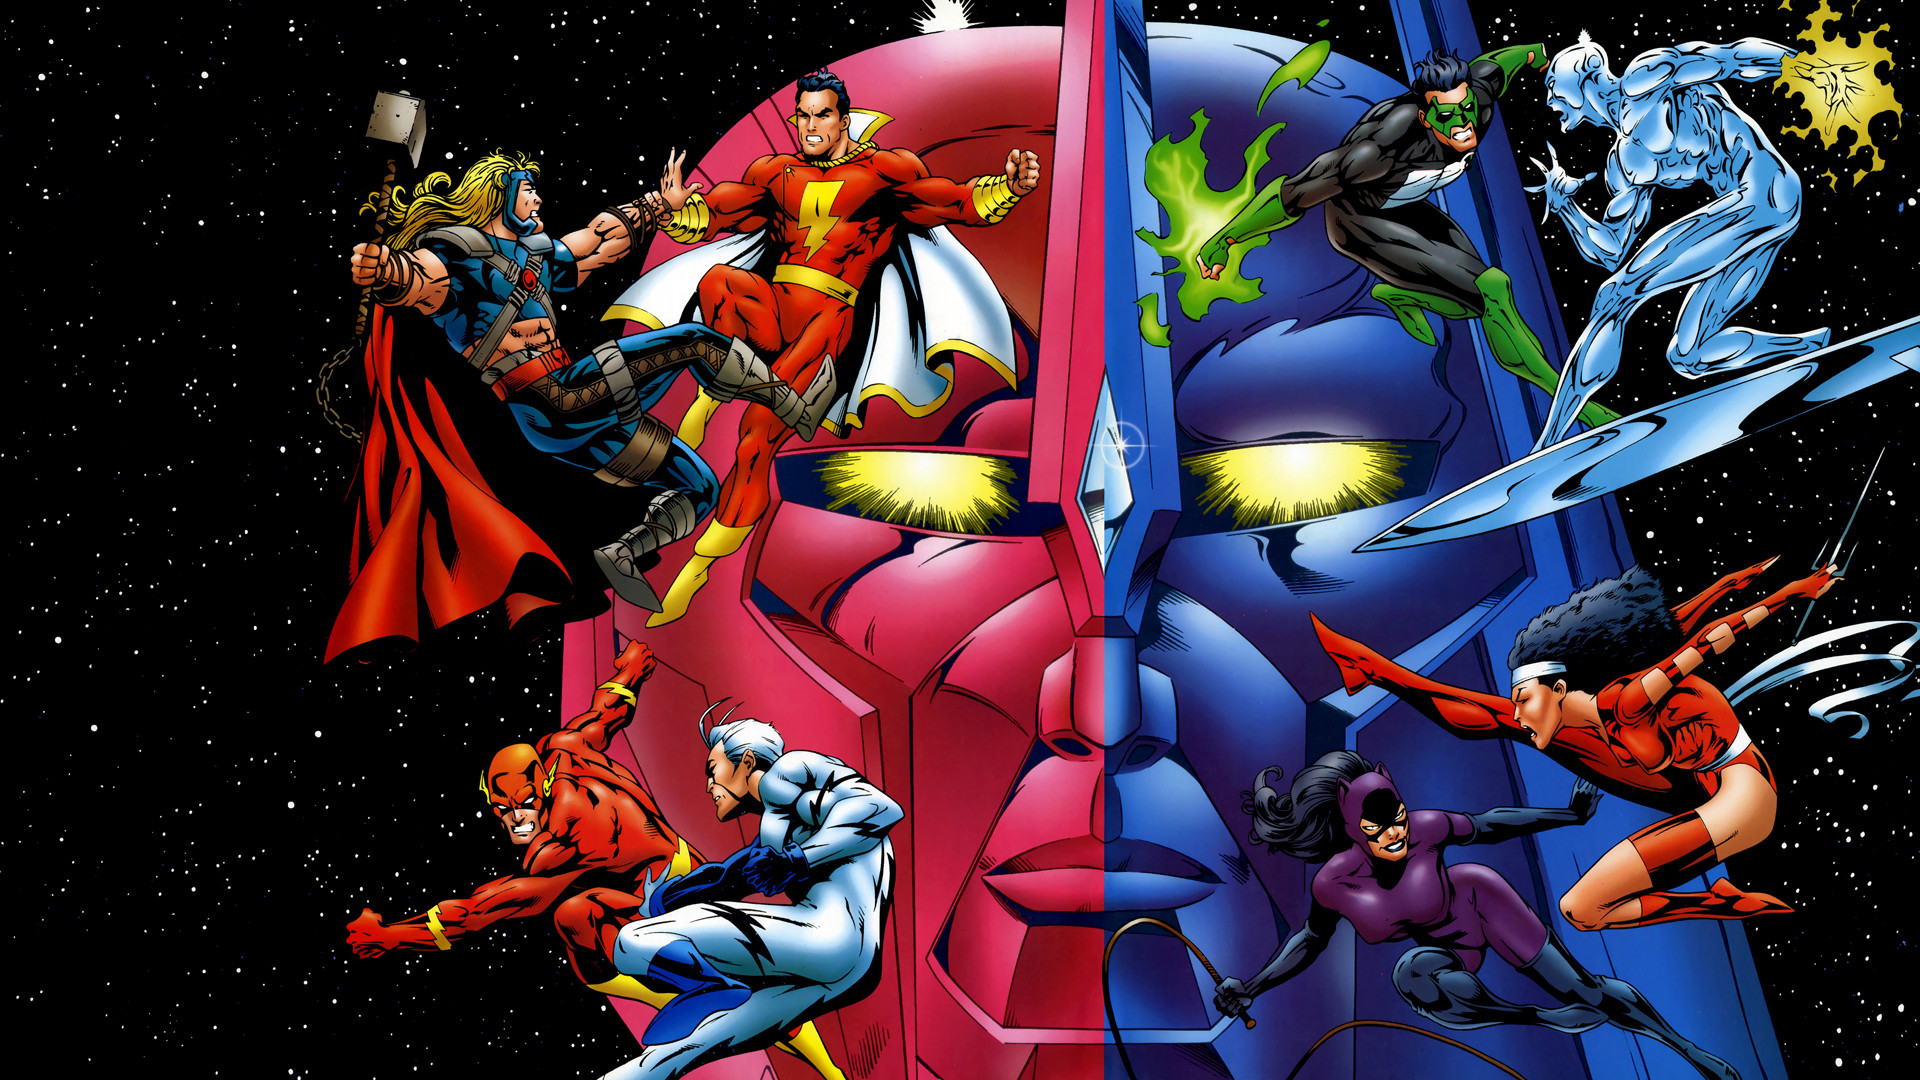 Comics – Collage Shazam Thor Flash Catwoman Silver Surfer Wallpaper